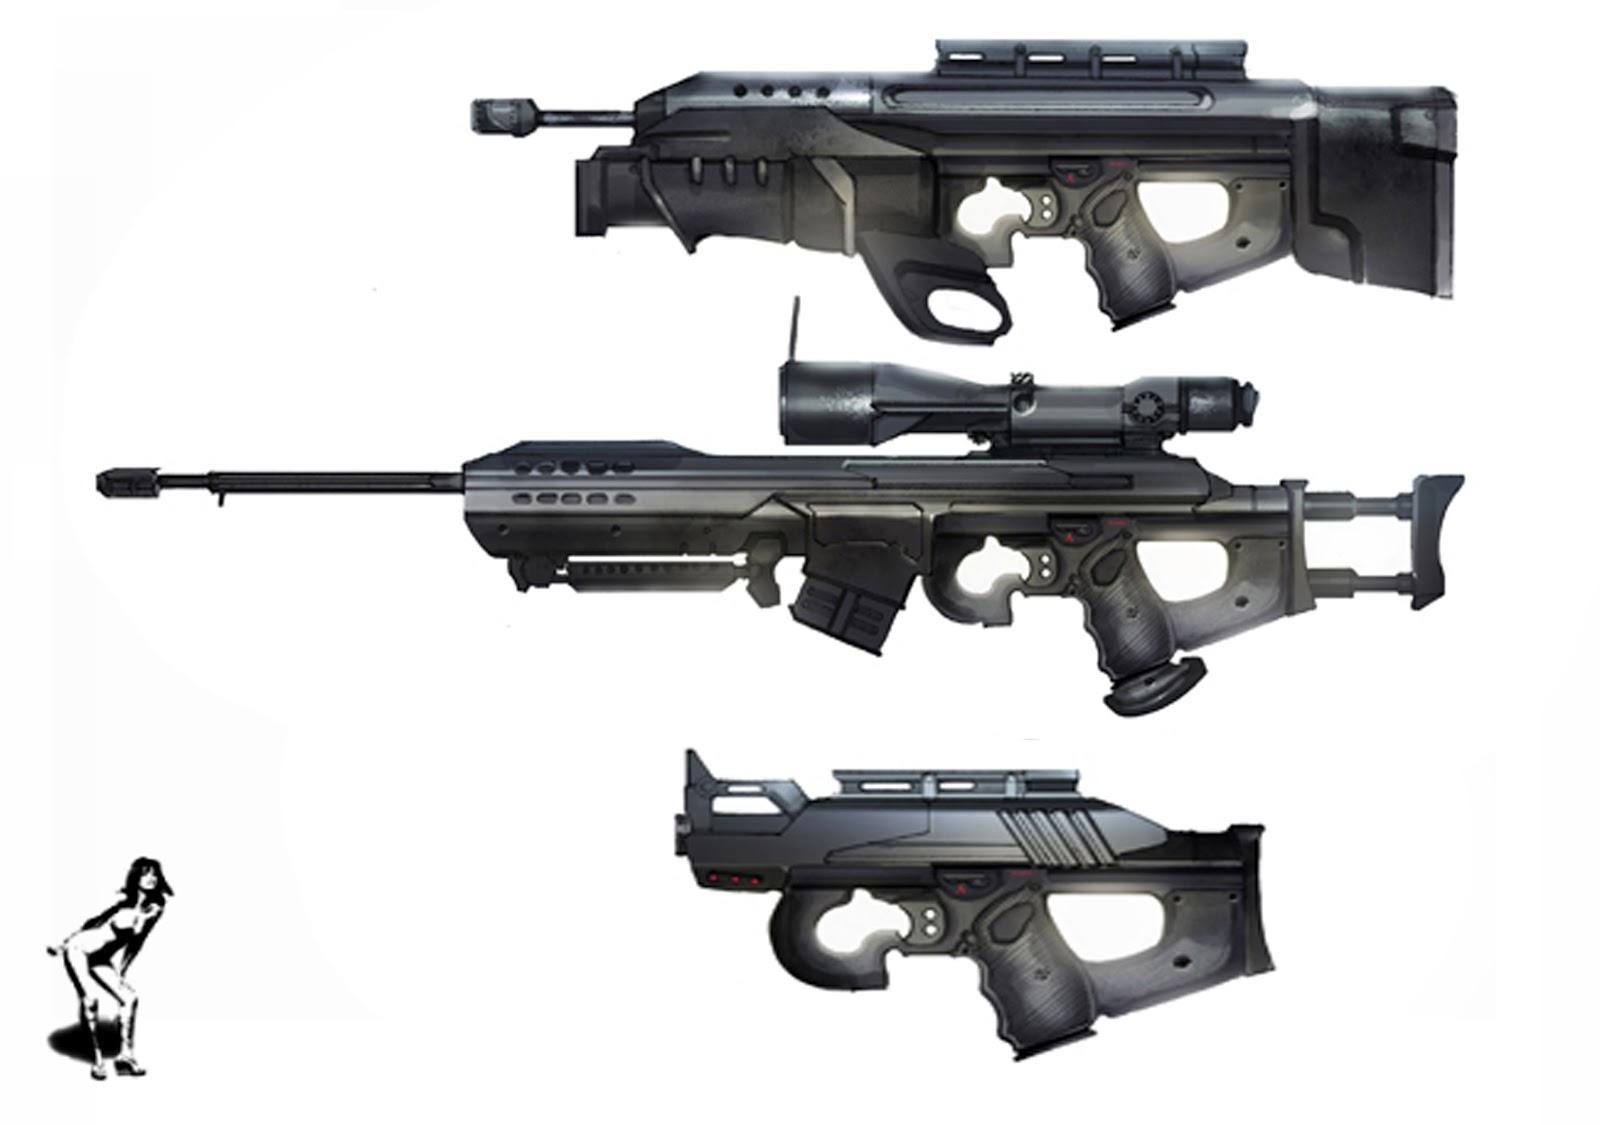 semi machine gun